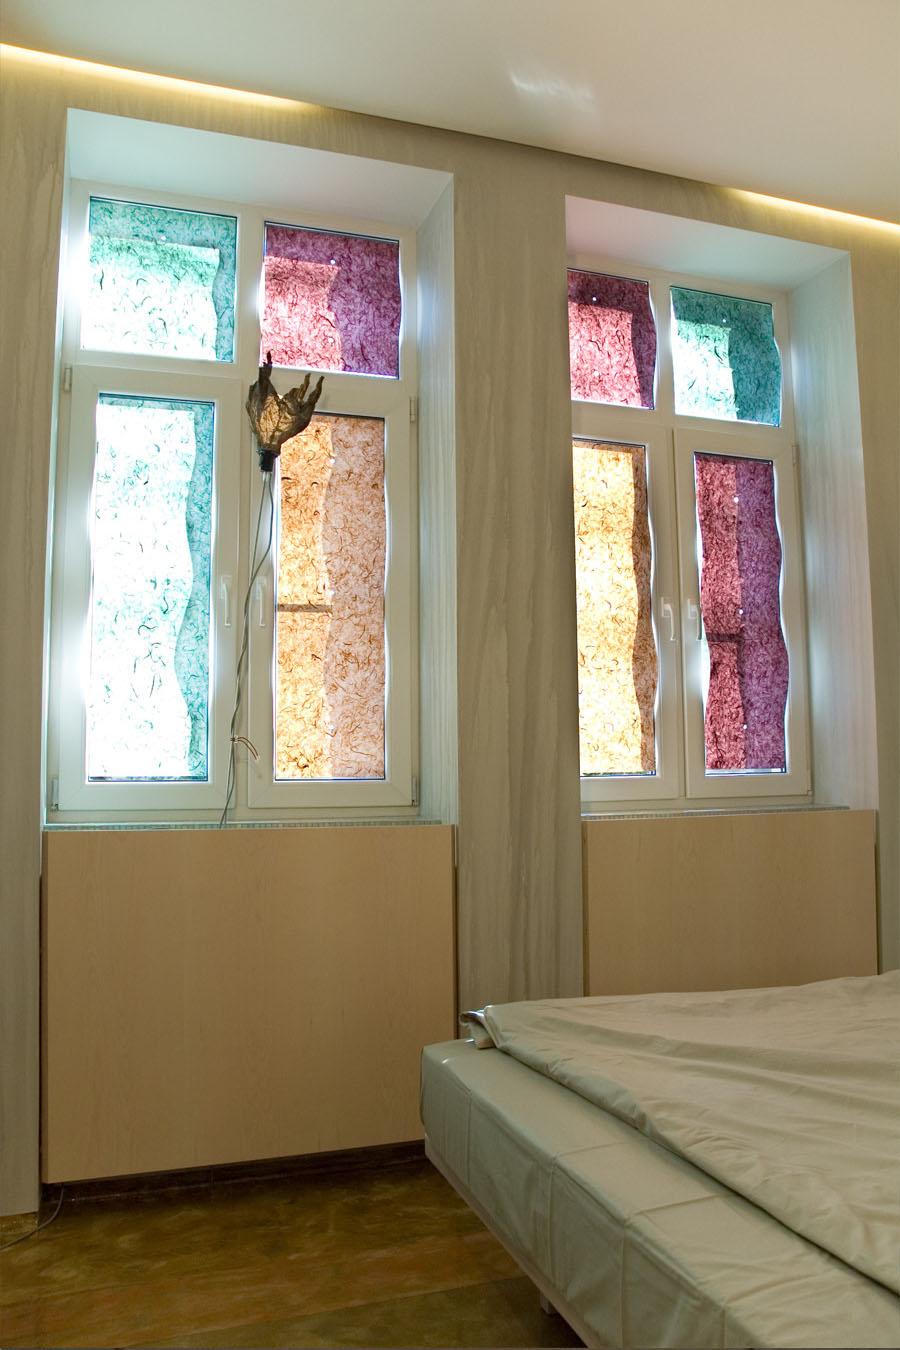 Freydenberg_Apartment_Hotel_57.jpg